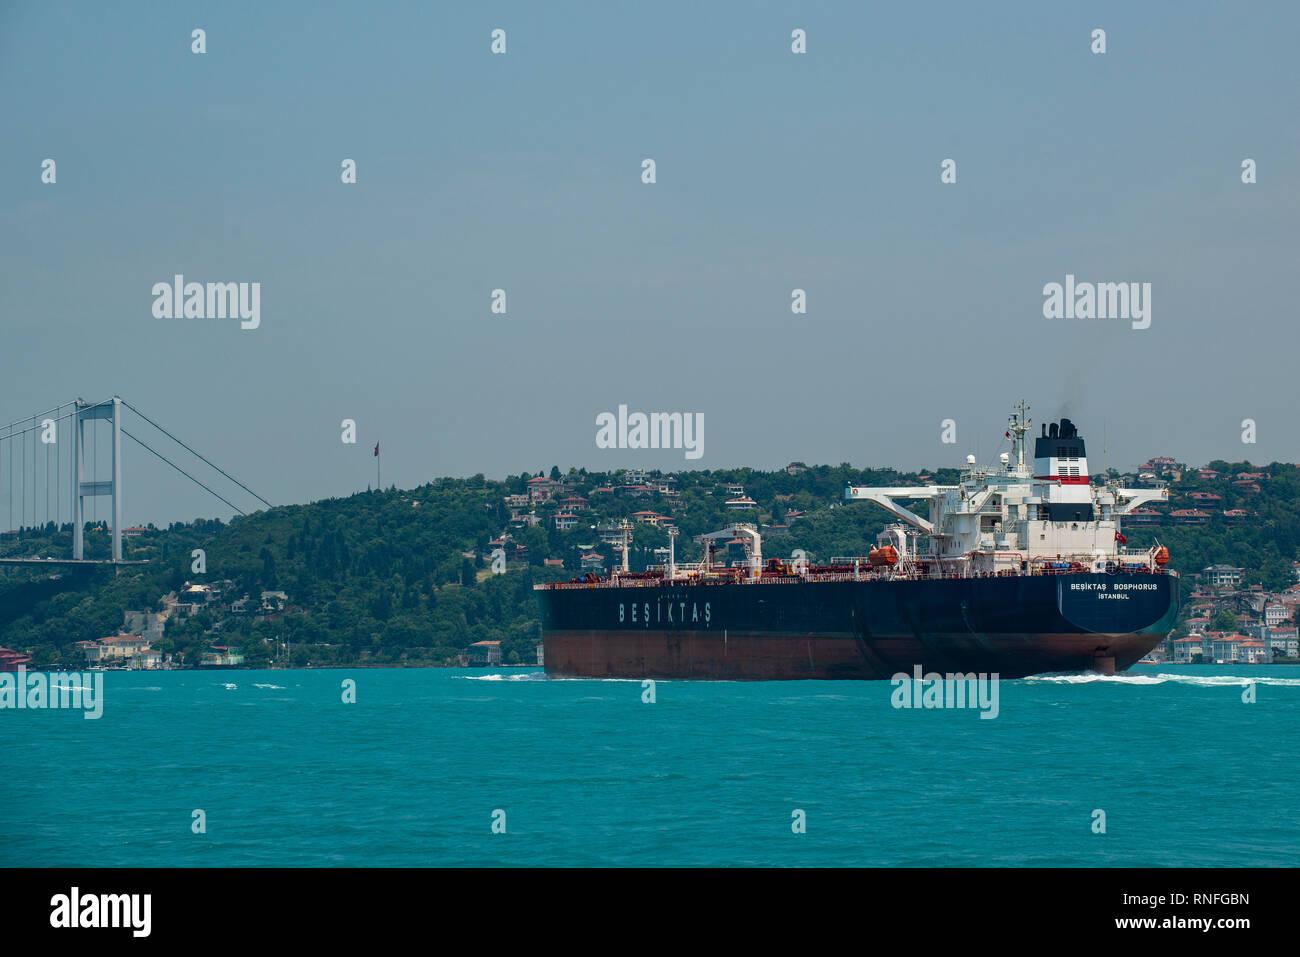 Crude oil tanker Besiktas Bosphorus on the Bosphorus, Istanbul, Turkey. - Stock Image